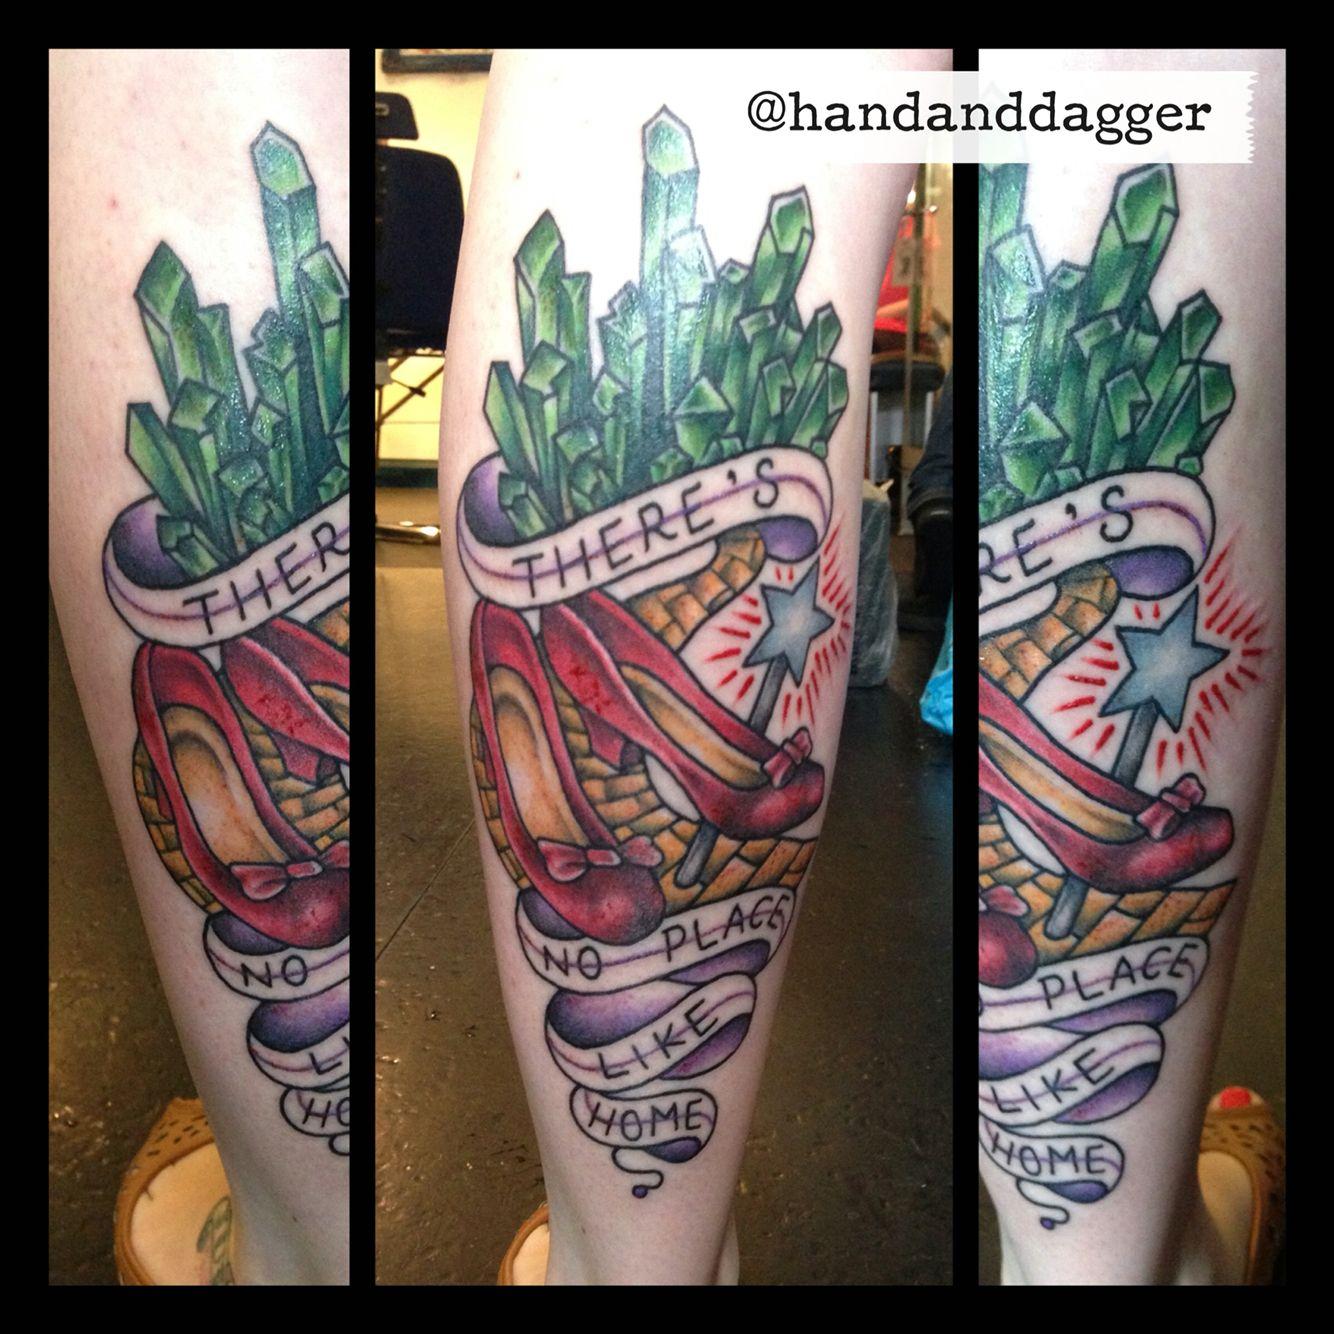 c41b92e1e Traditional Wizard Of Oz tattoo by Jenna Hayes @handanddagger Tattoo Studio,  Belfast